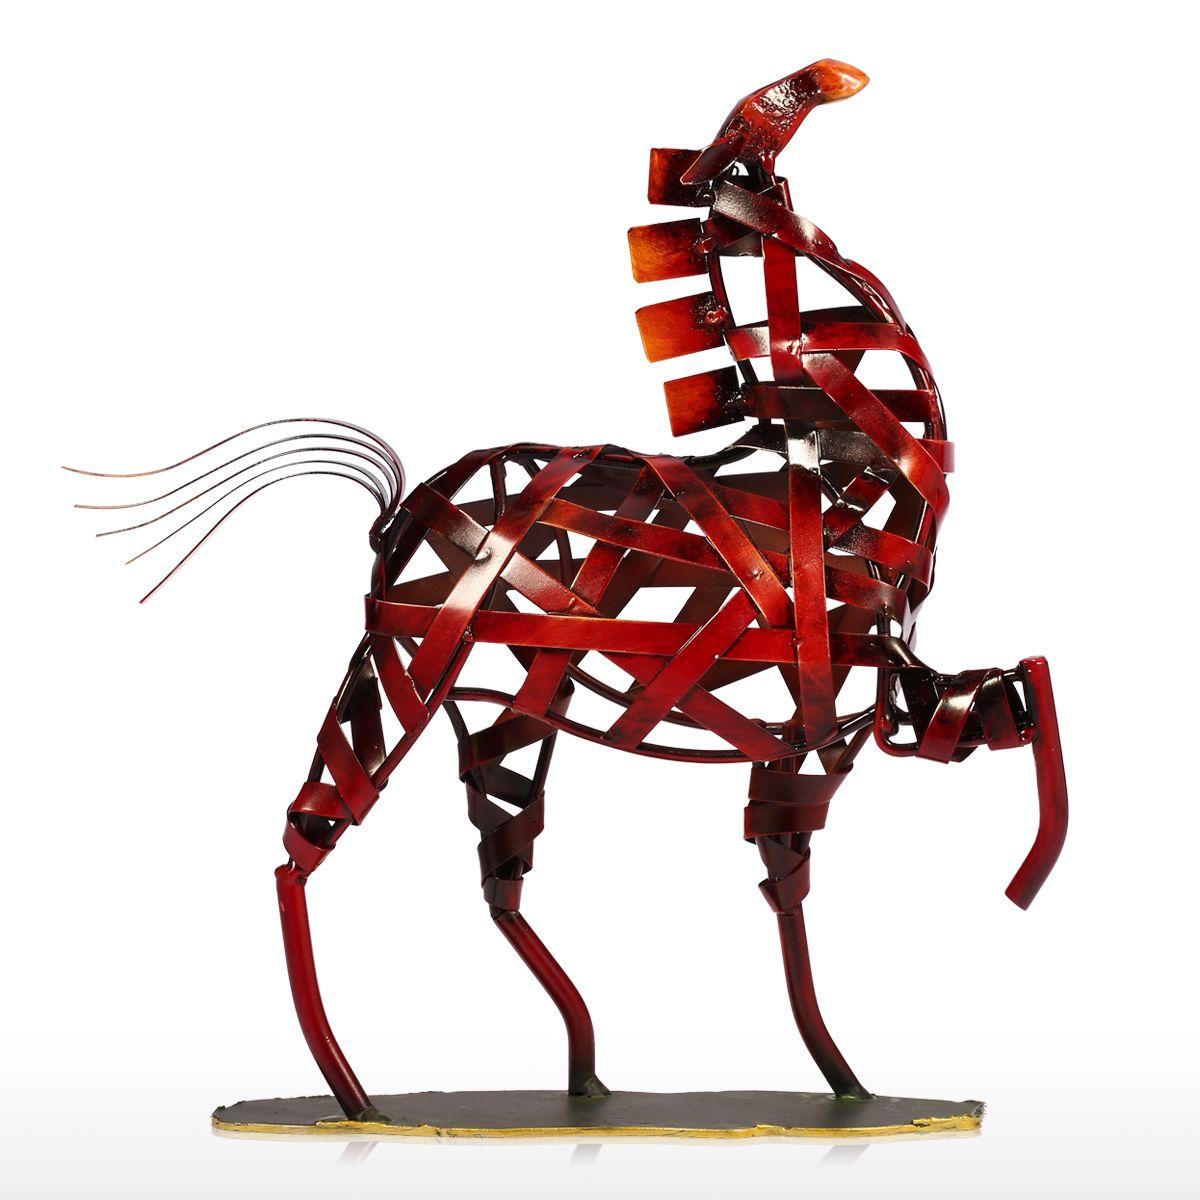 Tooarts Metal Braided Horse Artwork Sculpture Iron Weaving Horse